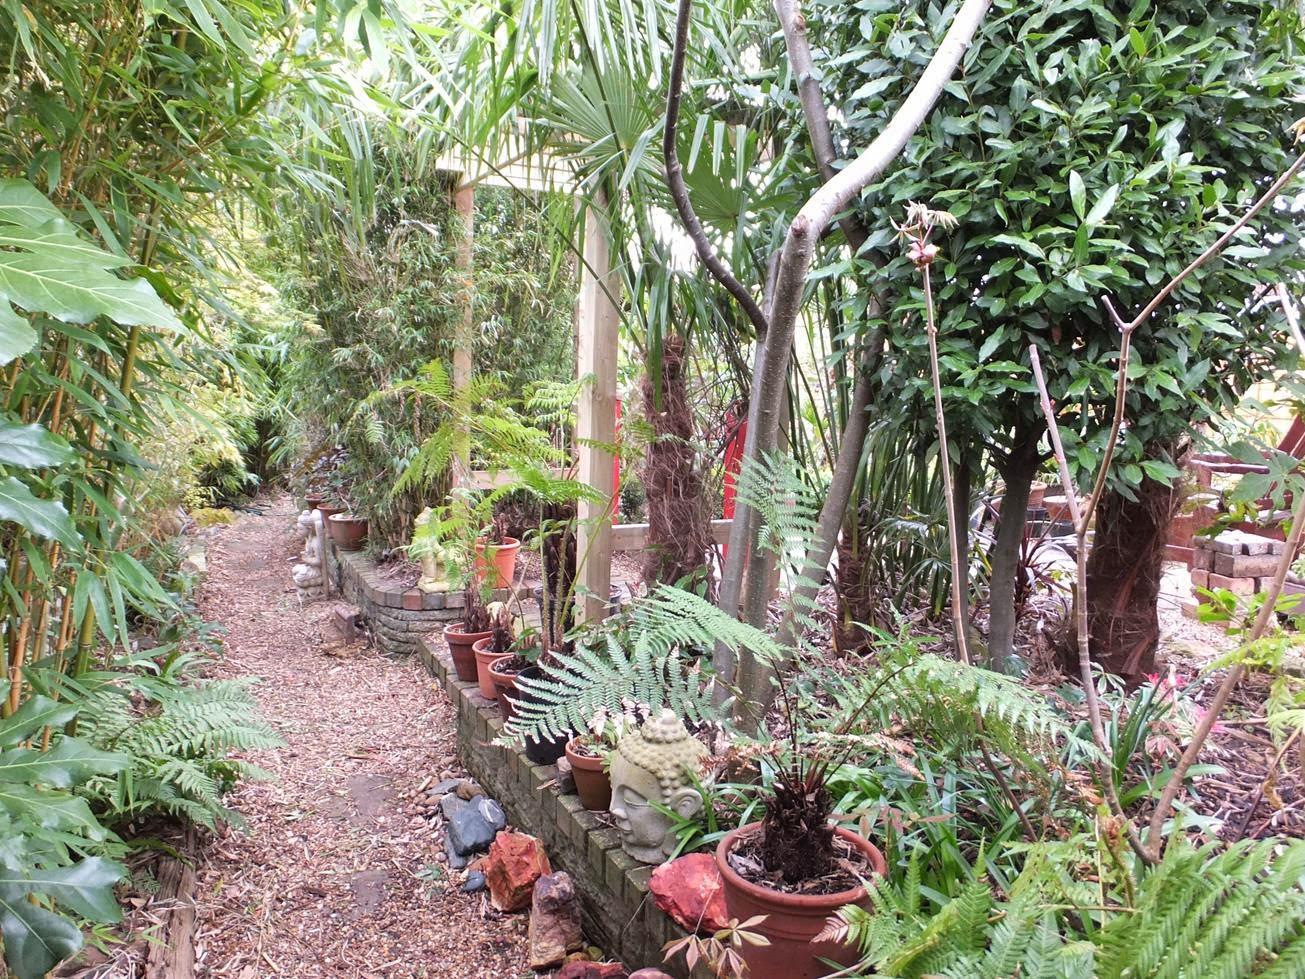 Alternative Eden Exotic Garden: Spring Scenes in the Garden